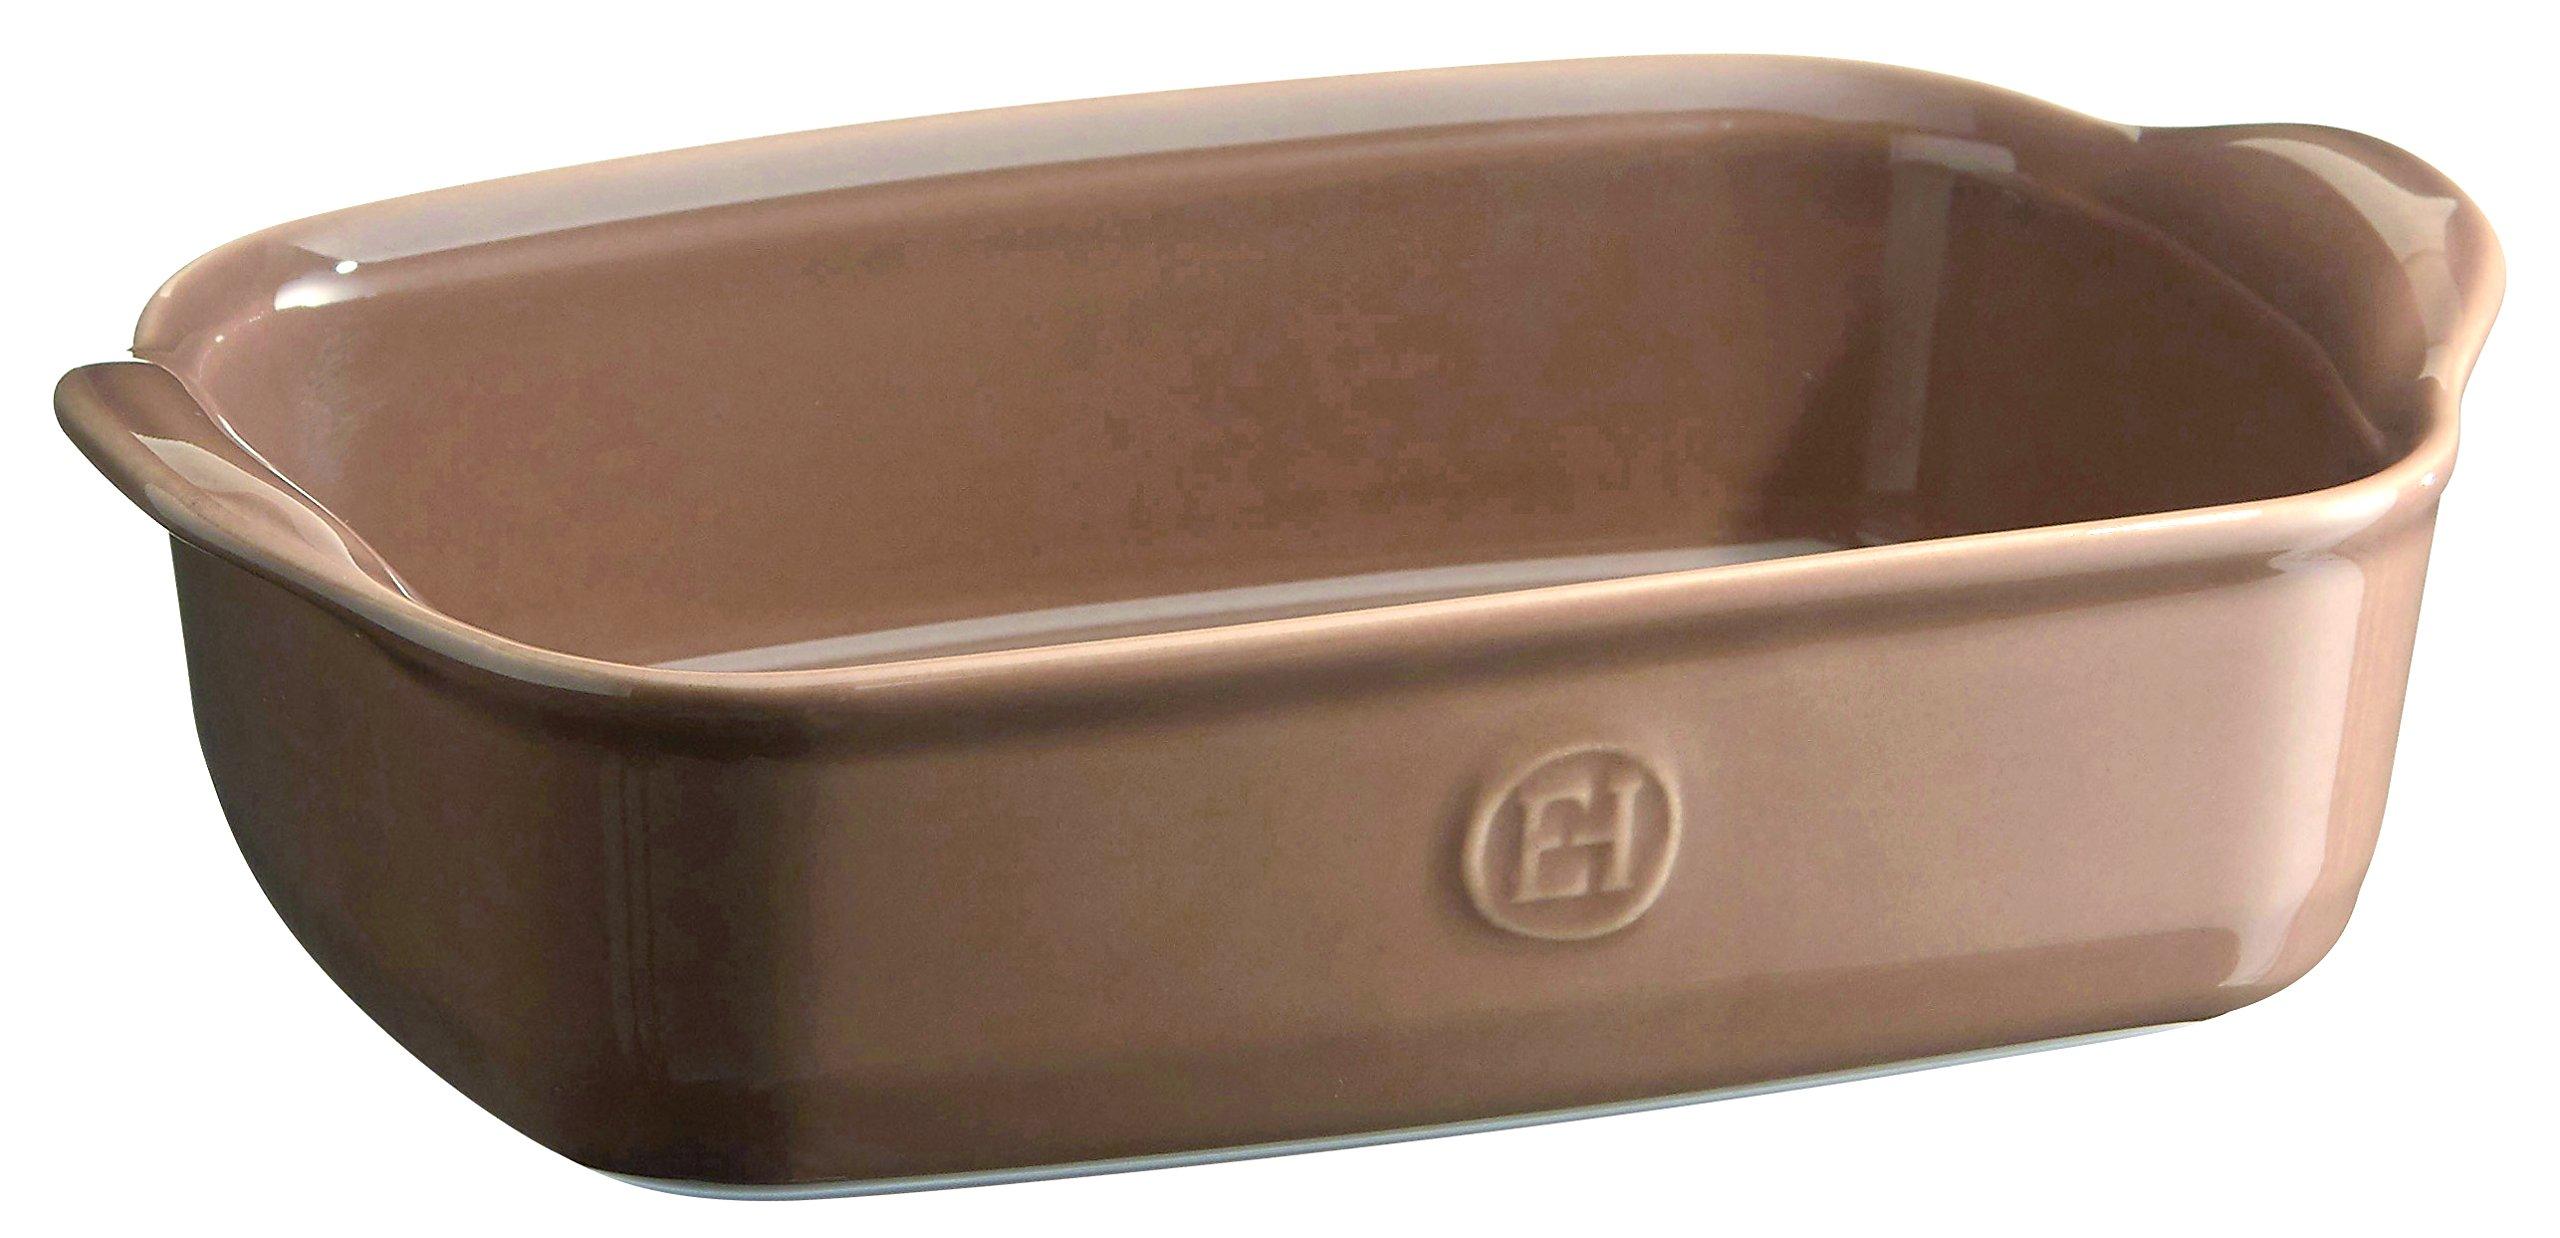 Emile Henry 969649 France Ovenware Ultime Rectangular Baking Dish, 8.7 x 5, Oak